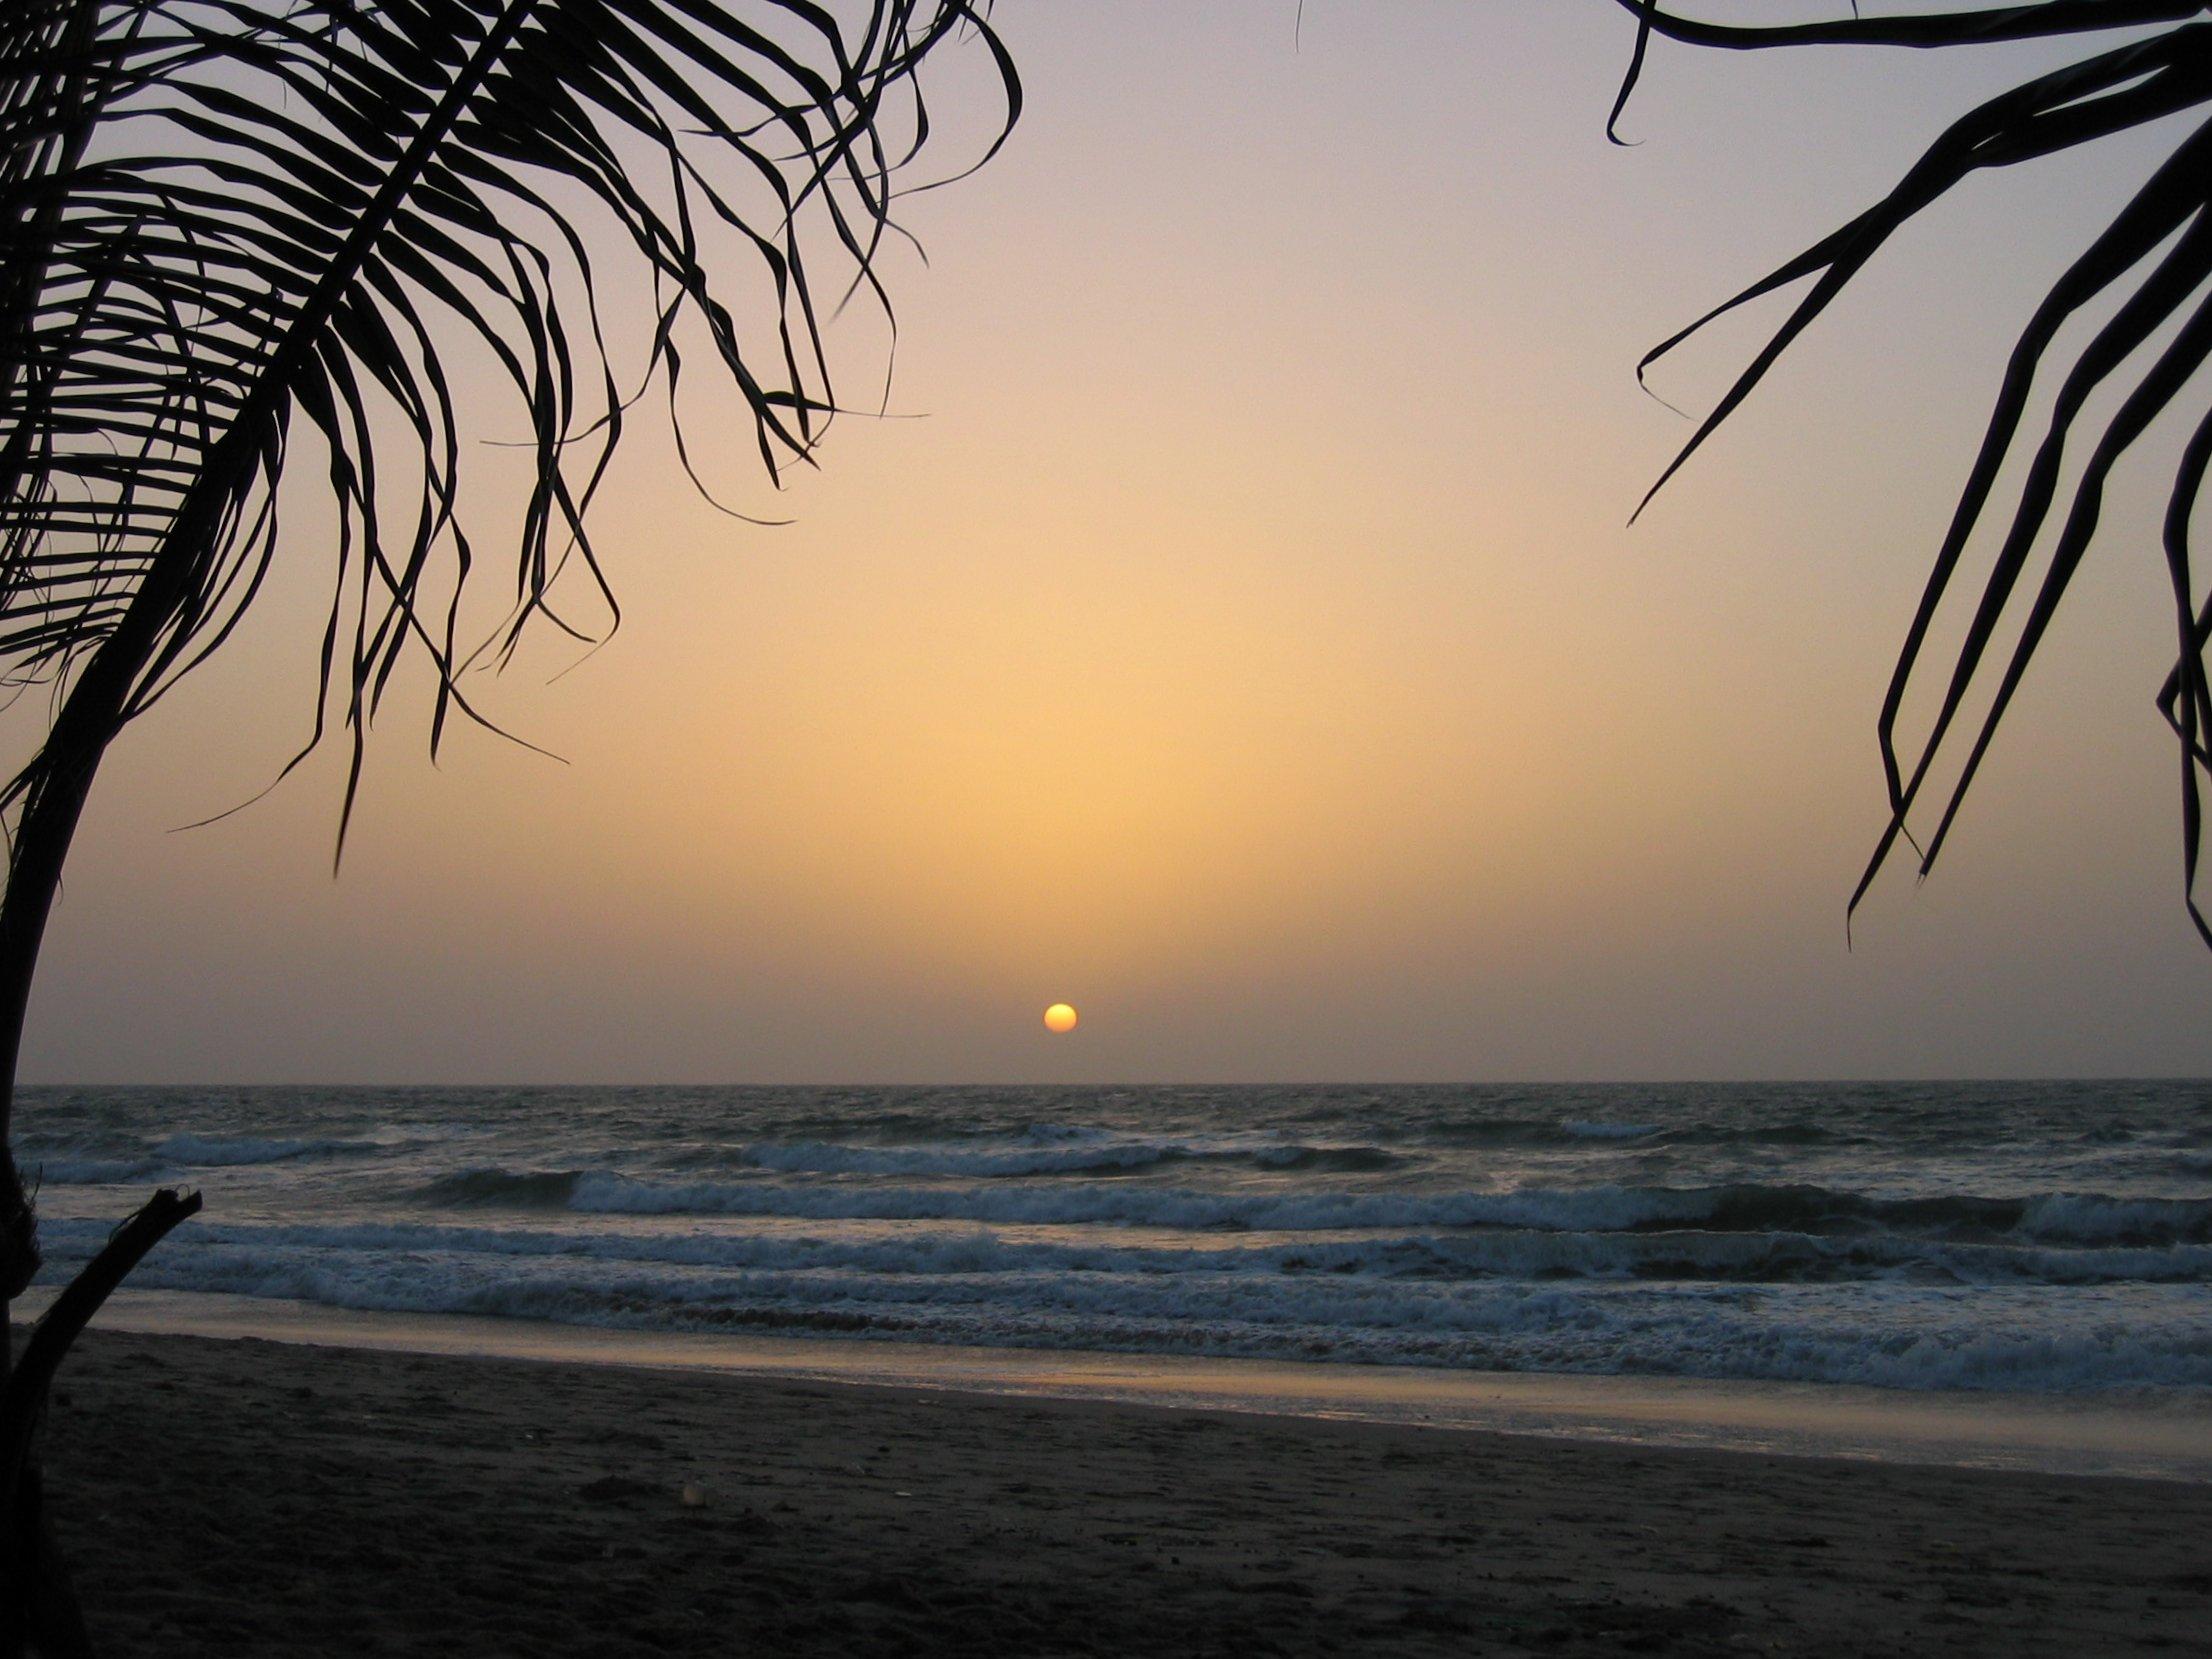 Sunset on the Gambian coast